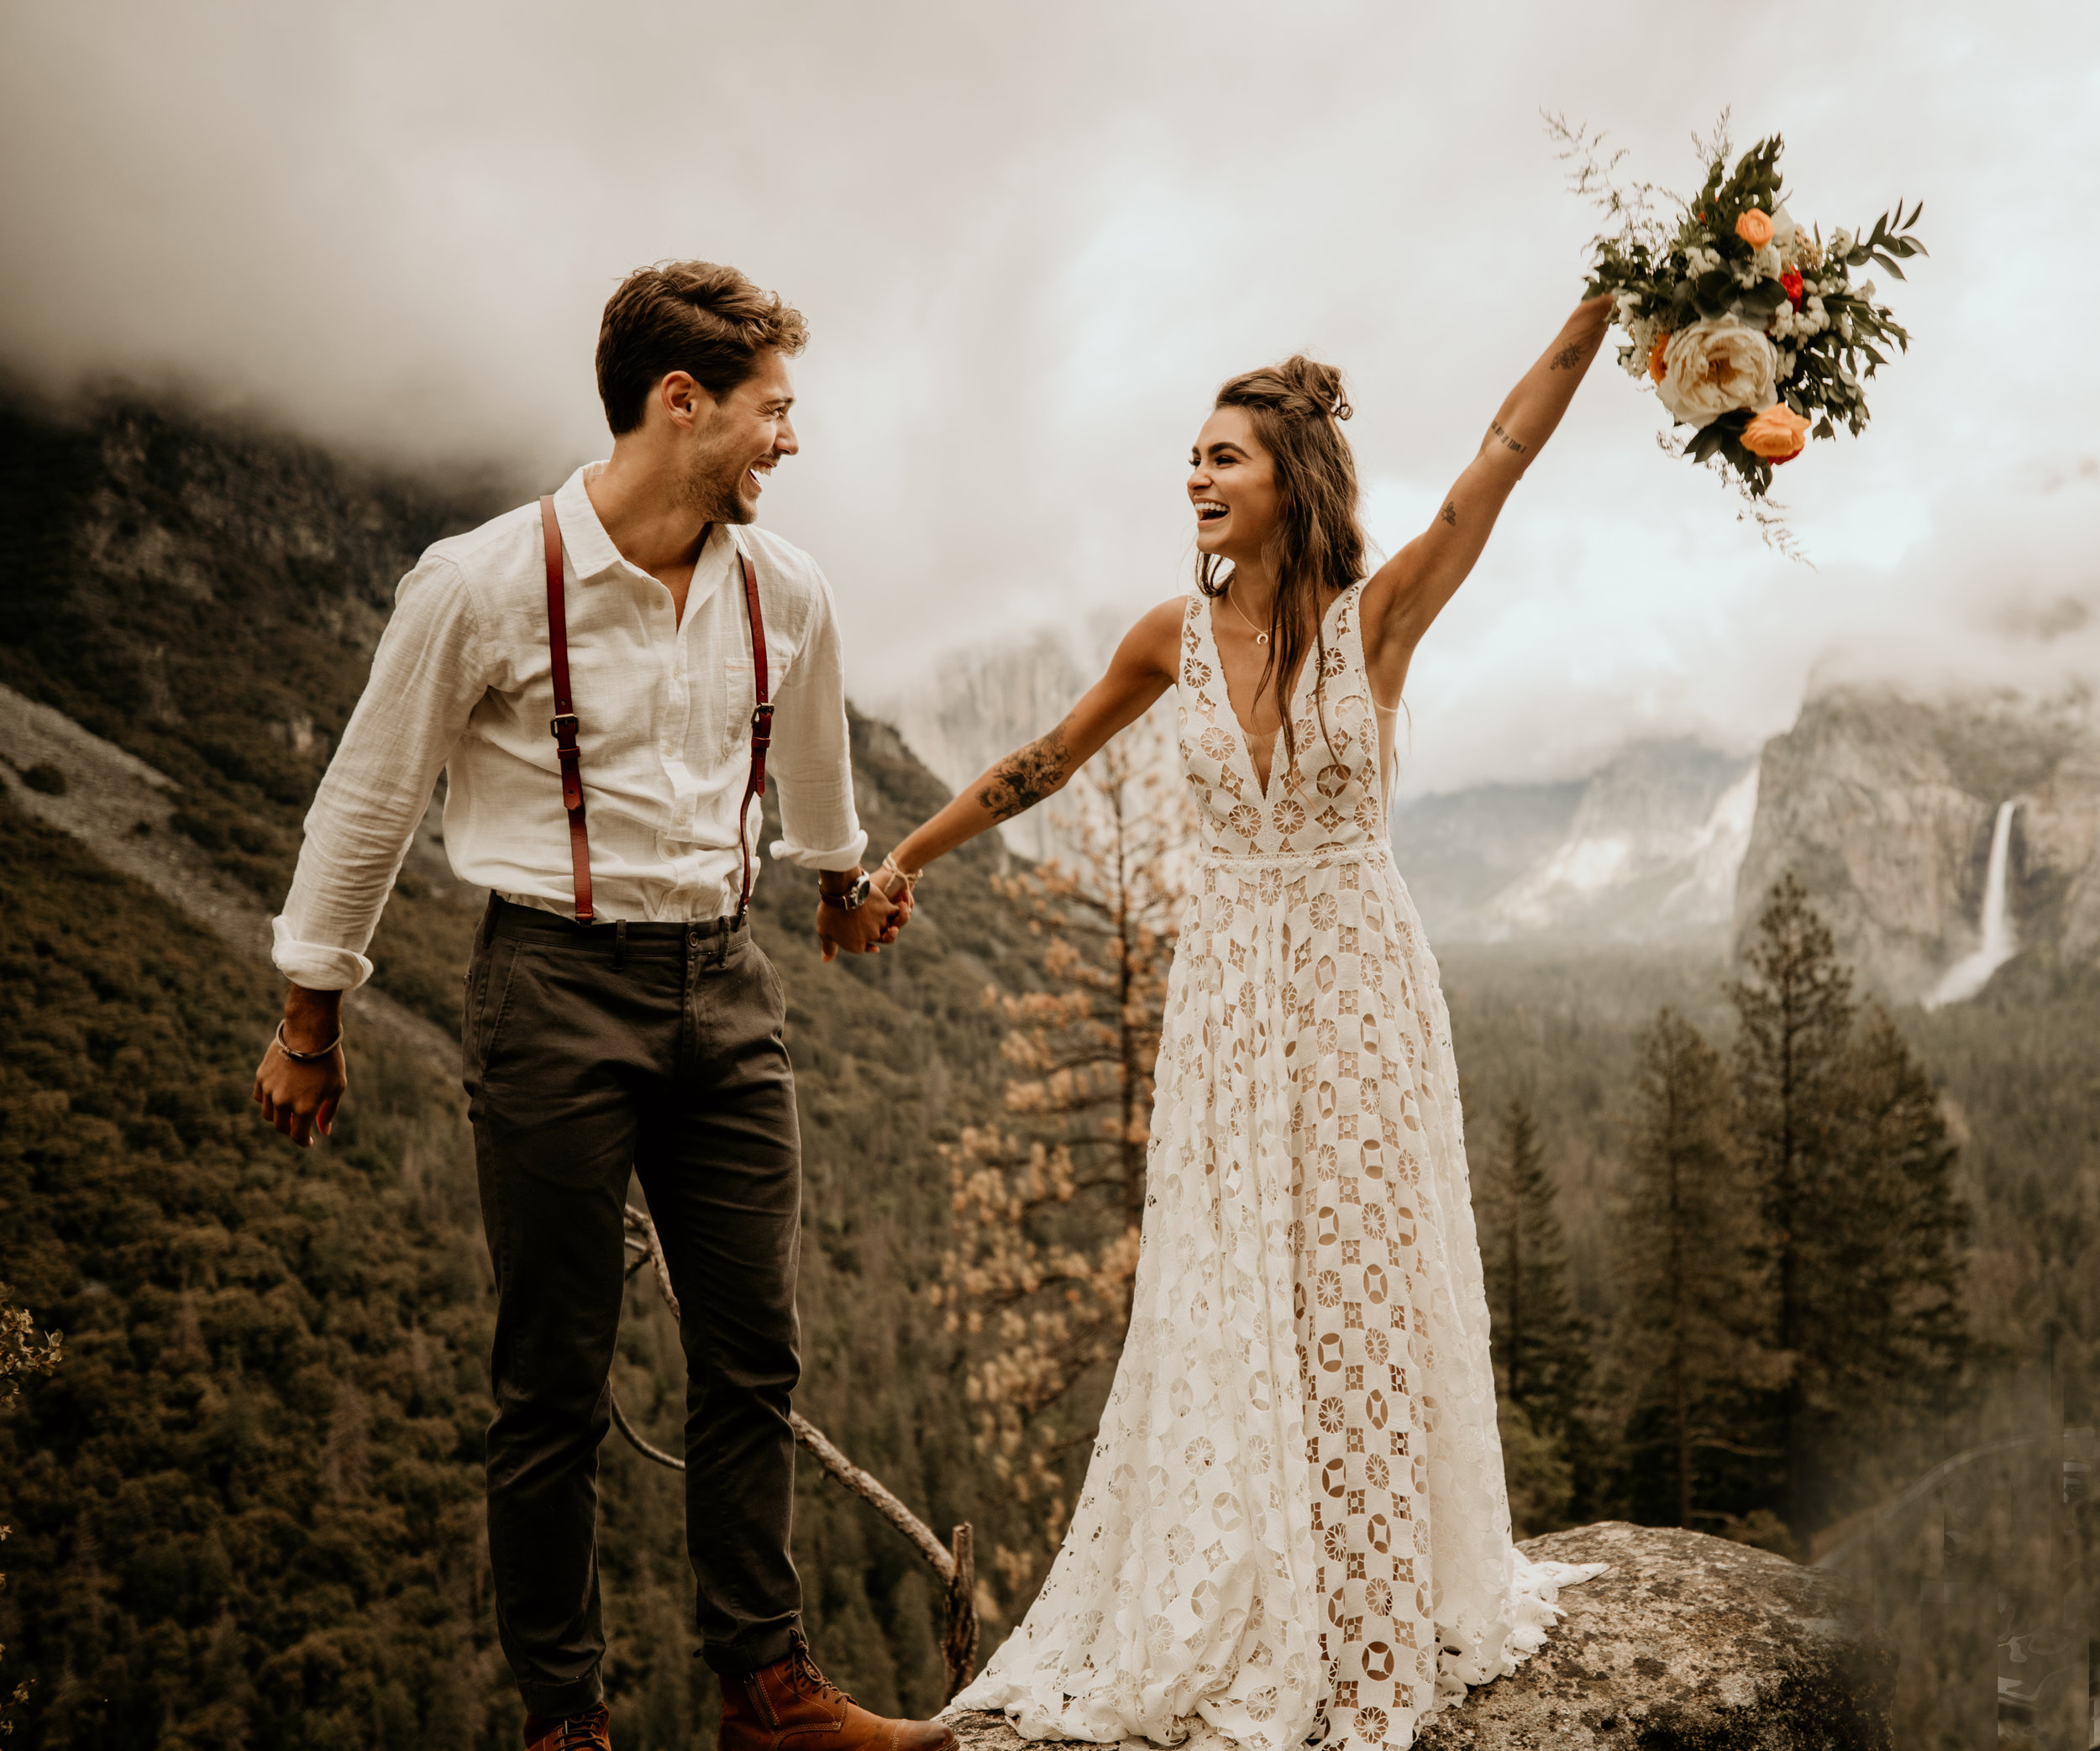 couples-engagement-outdoor-tattoo-photoshoot-little-rock-arkansas-9907.jpg